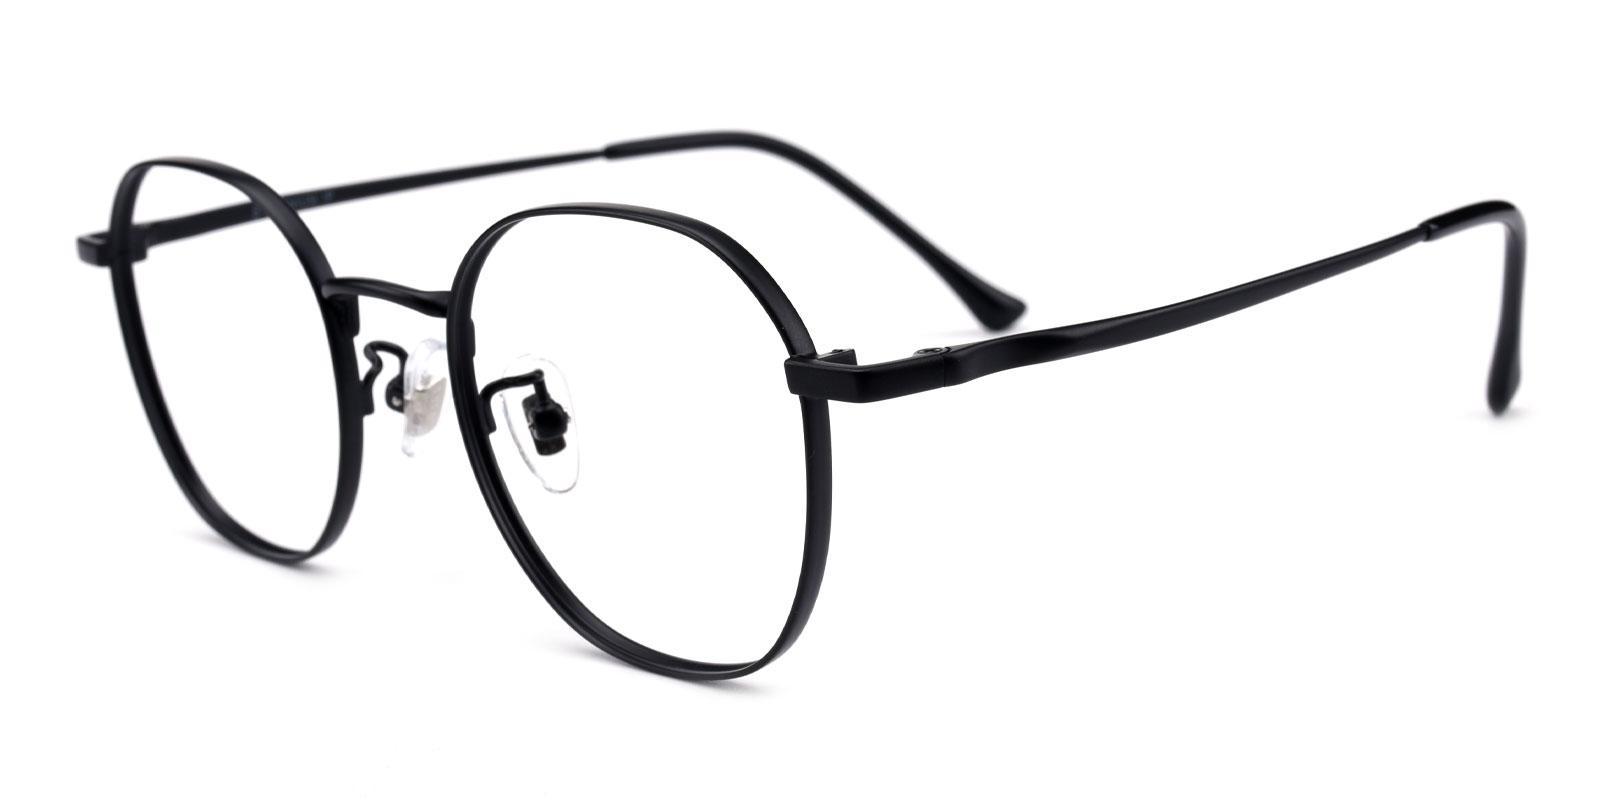 Iron-Black-Round-Titanium-Eyeglasses-additional1